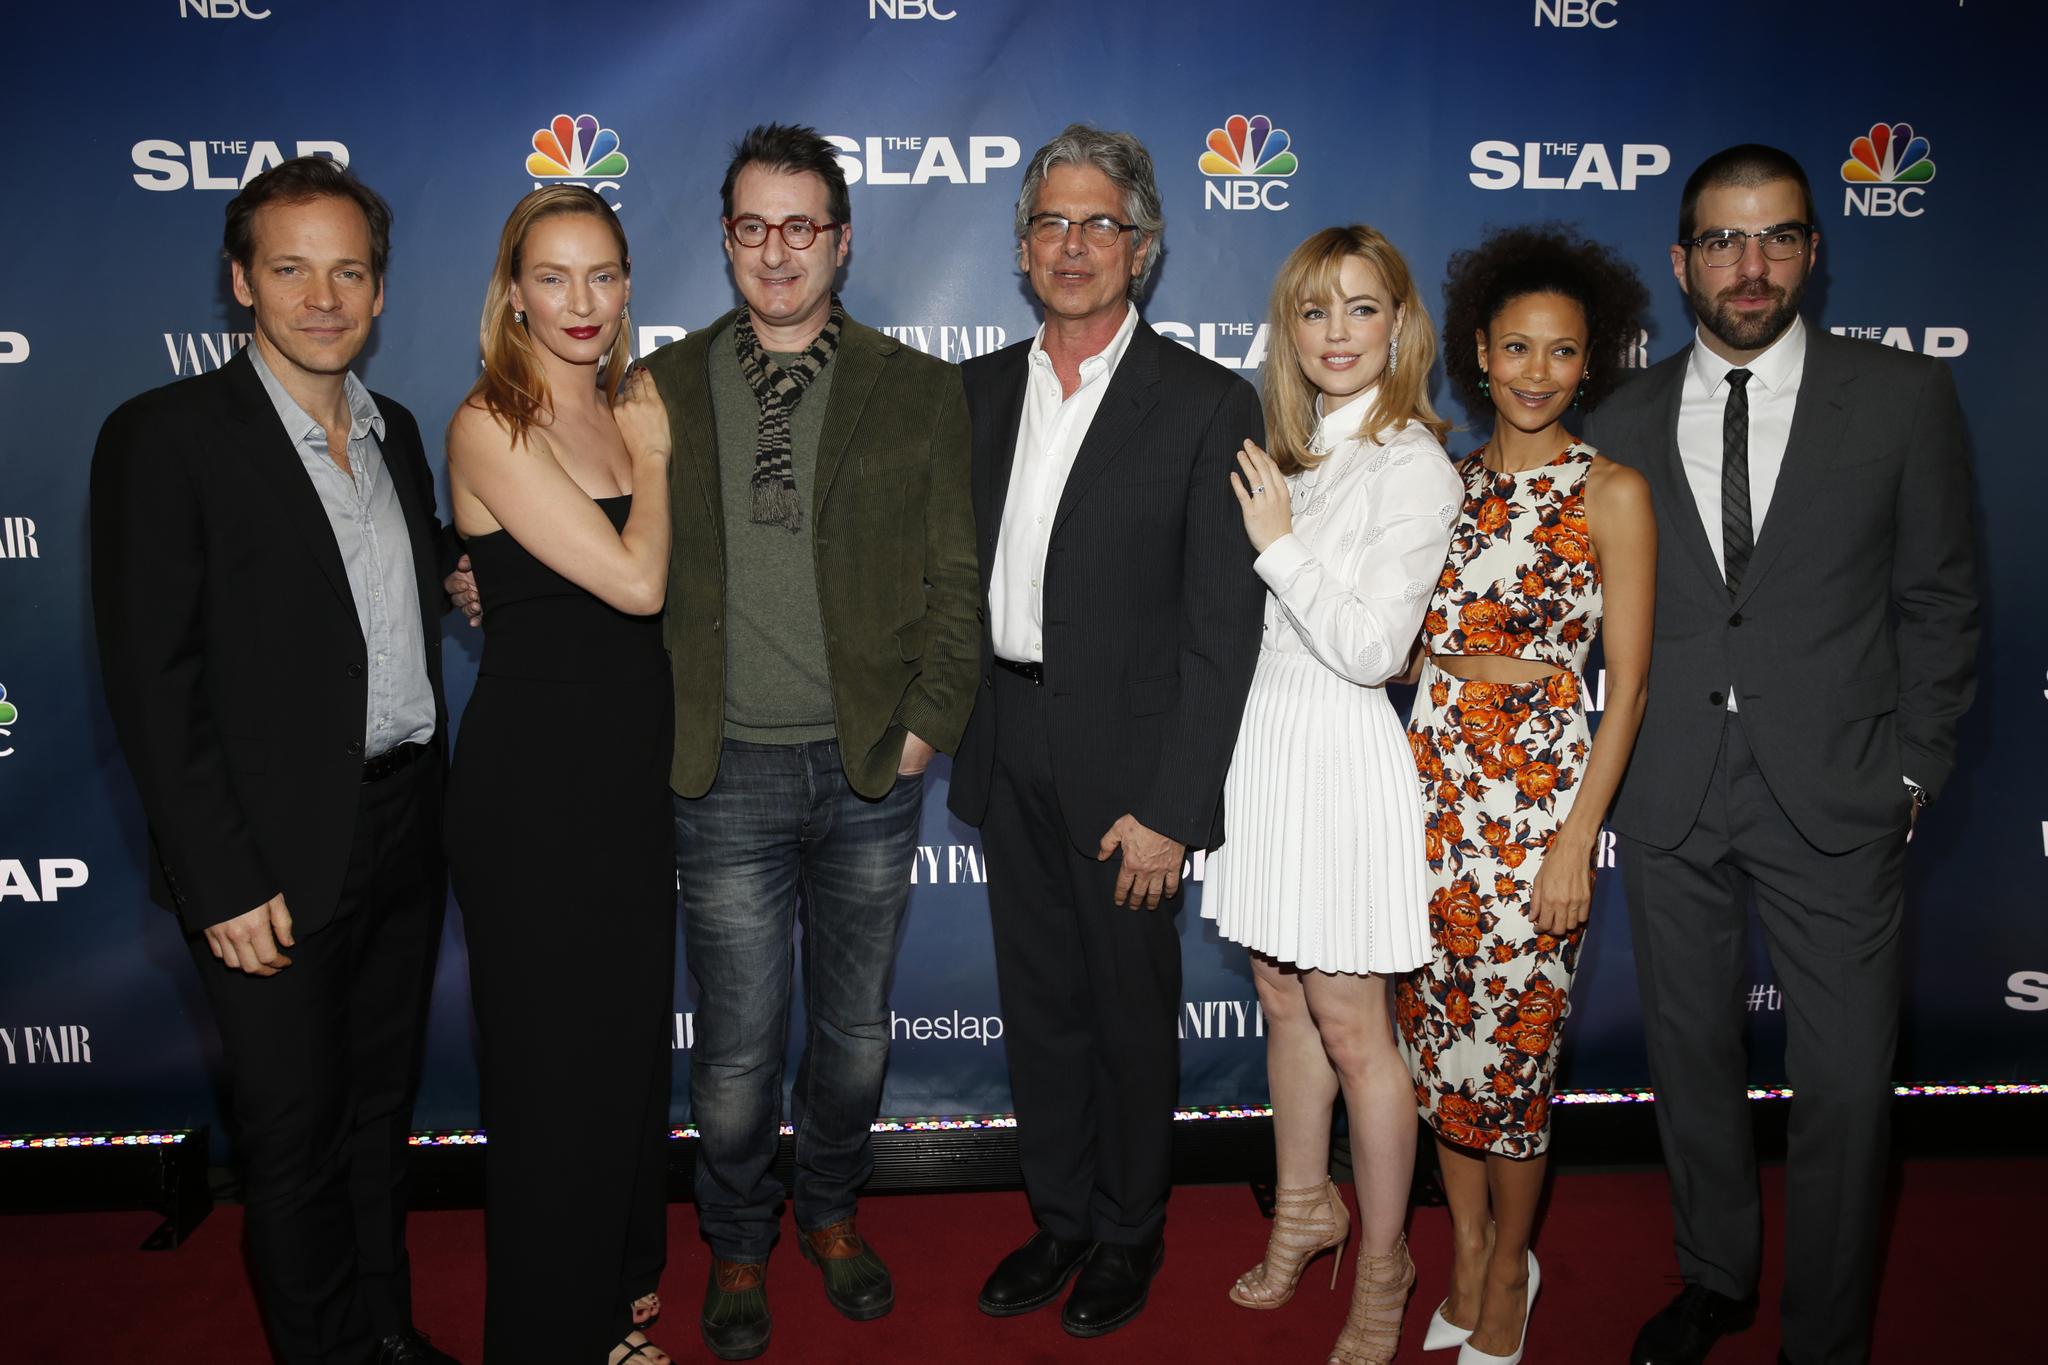 Uma Thurman, Jon Robin Baitz, Melissa George, Thandie Newton, Walter F. Parkes, Zachary Quinto and Peter Sarsgaard at event of The Slap (2015)